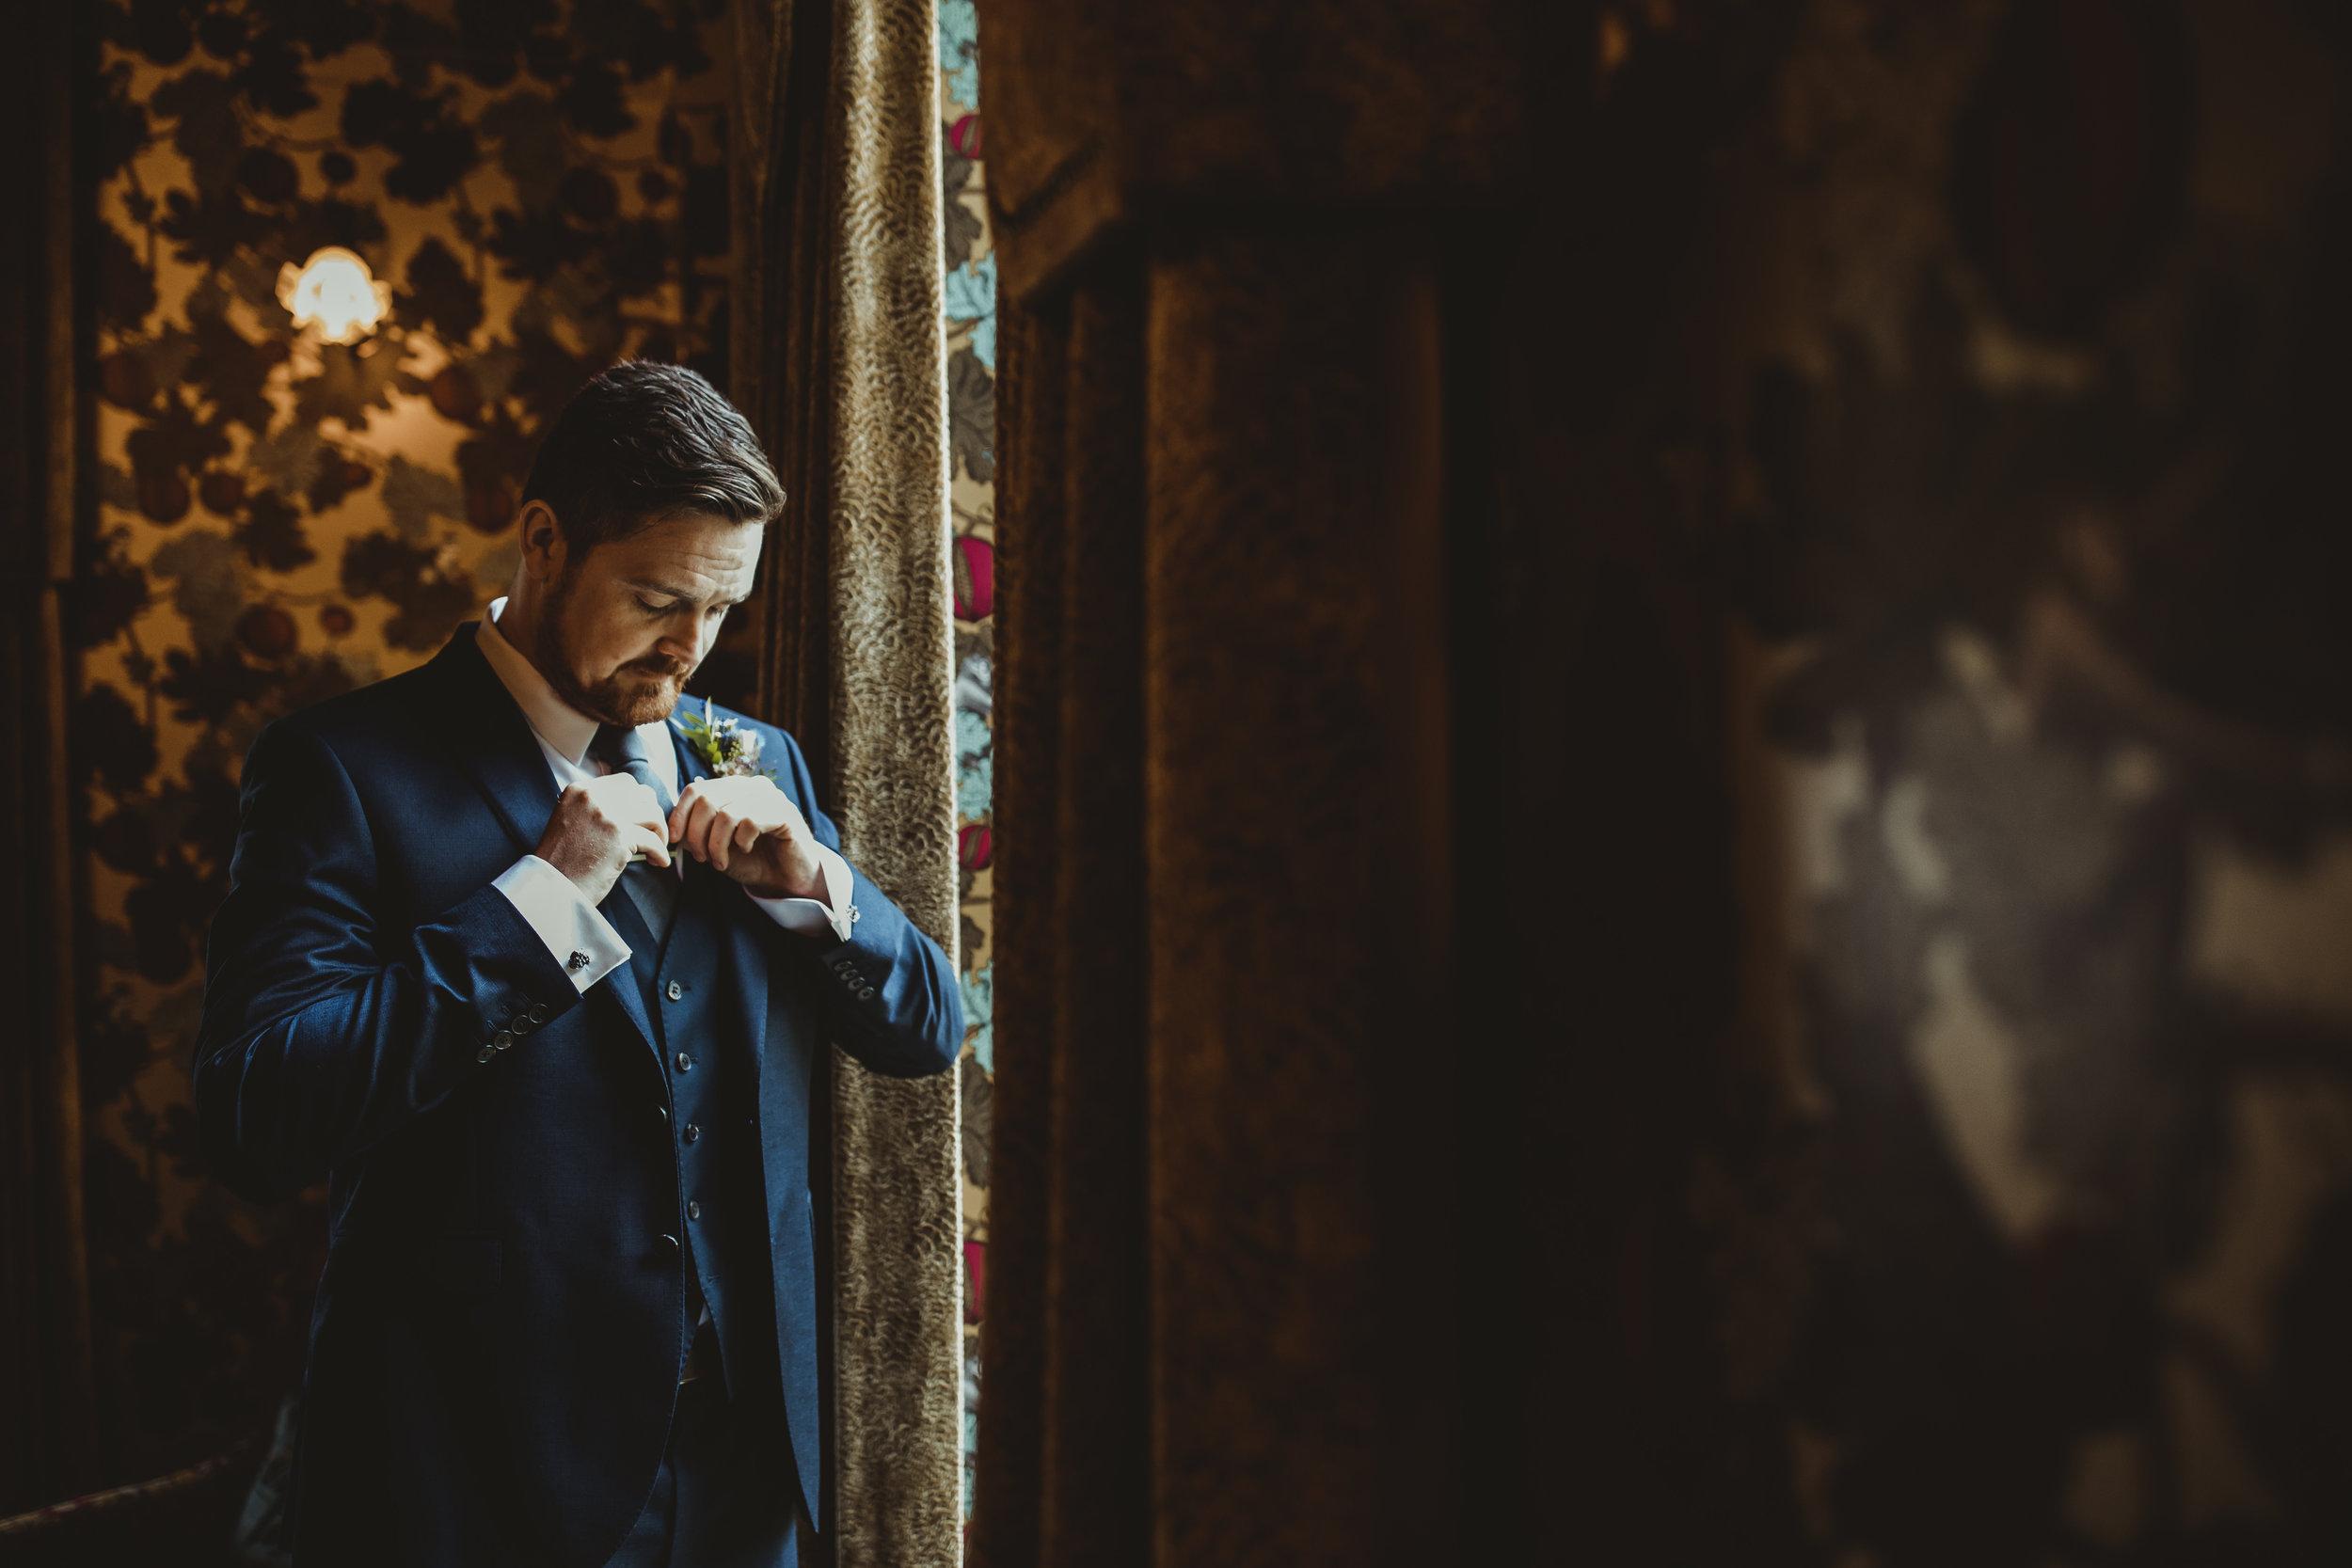 N&J_YORKSHIRE_WEDDING_PHOTOGRAPHER_MALTON_LEEDS_SHEFFIELD-303.JPG